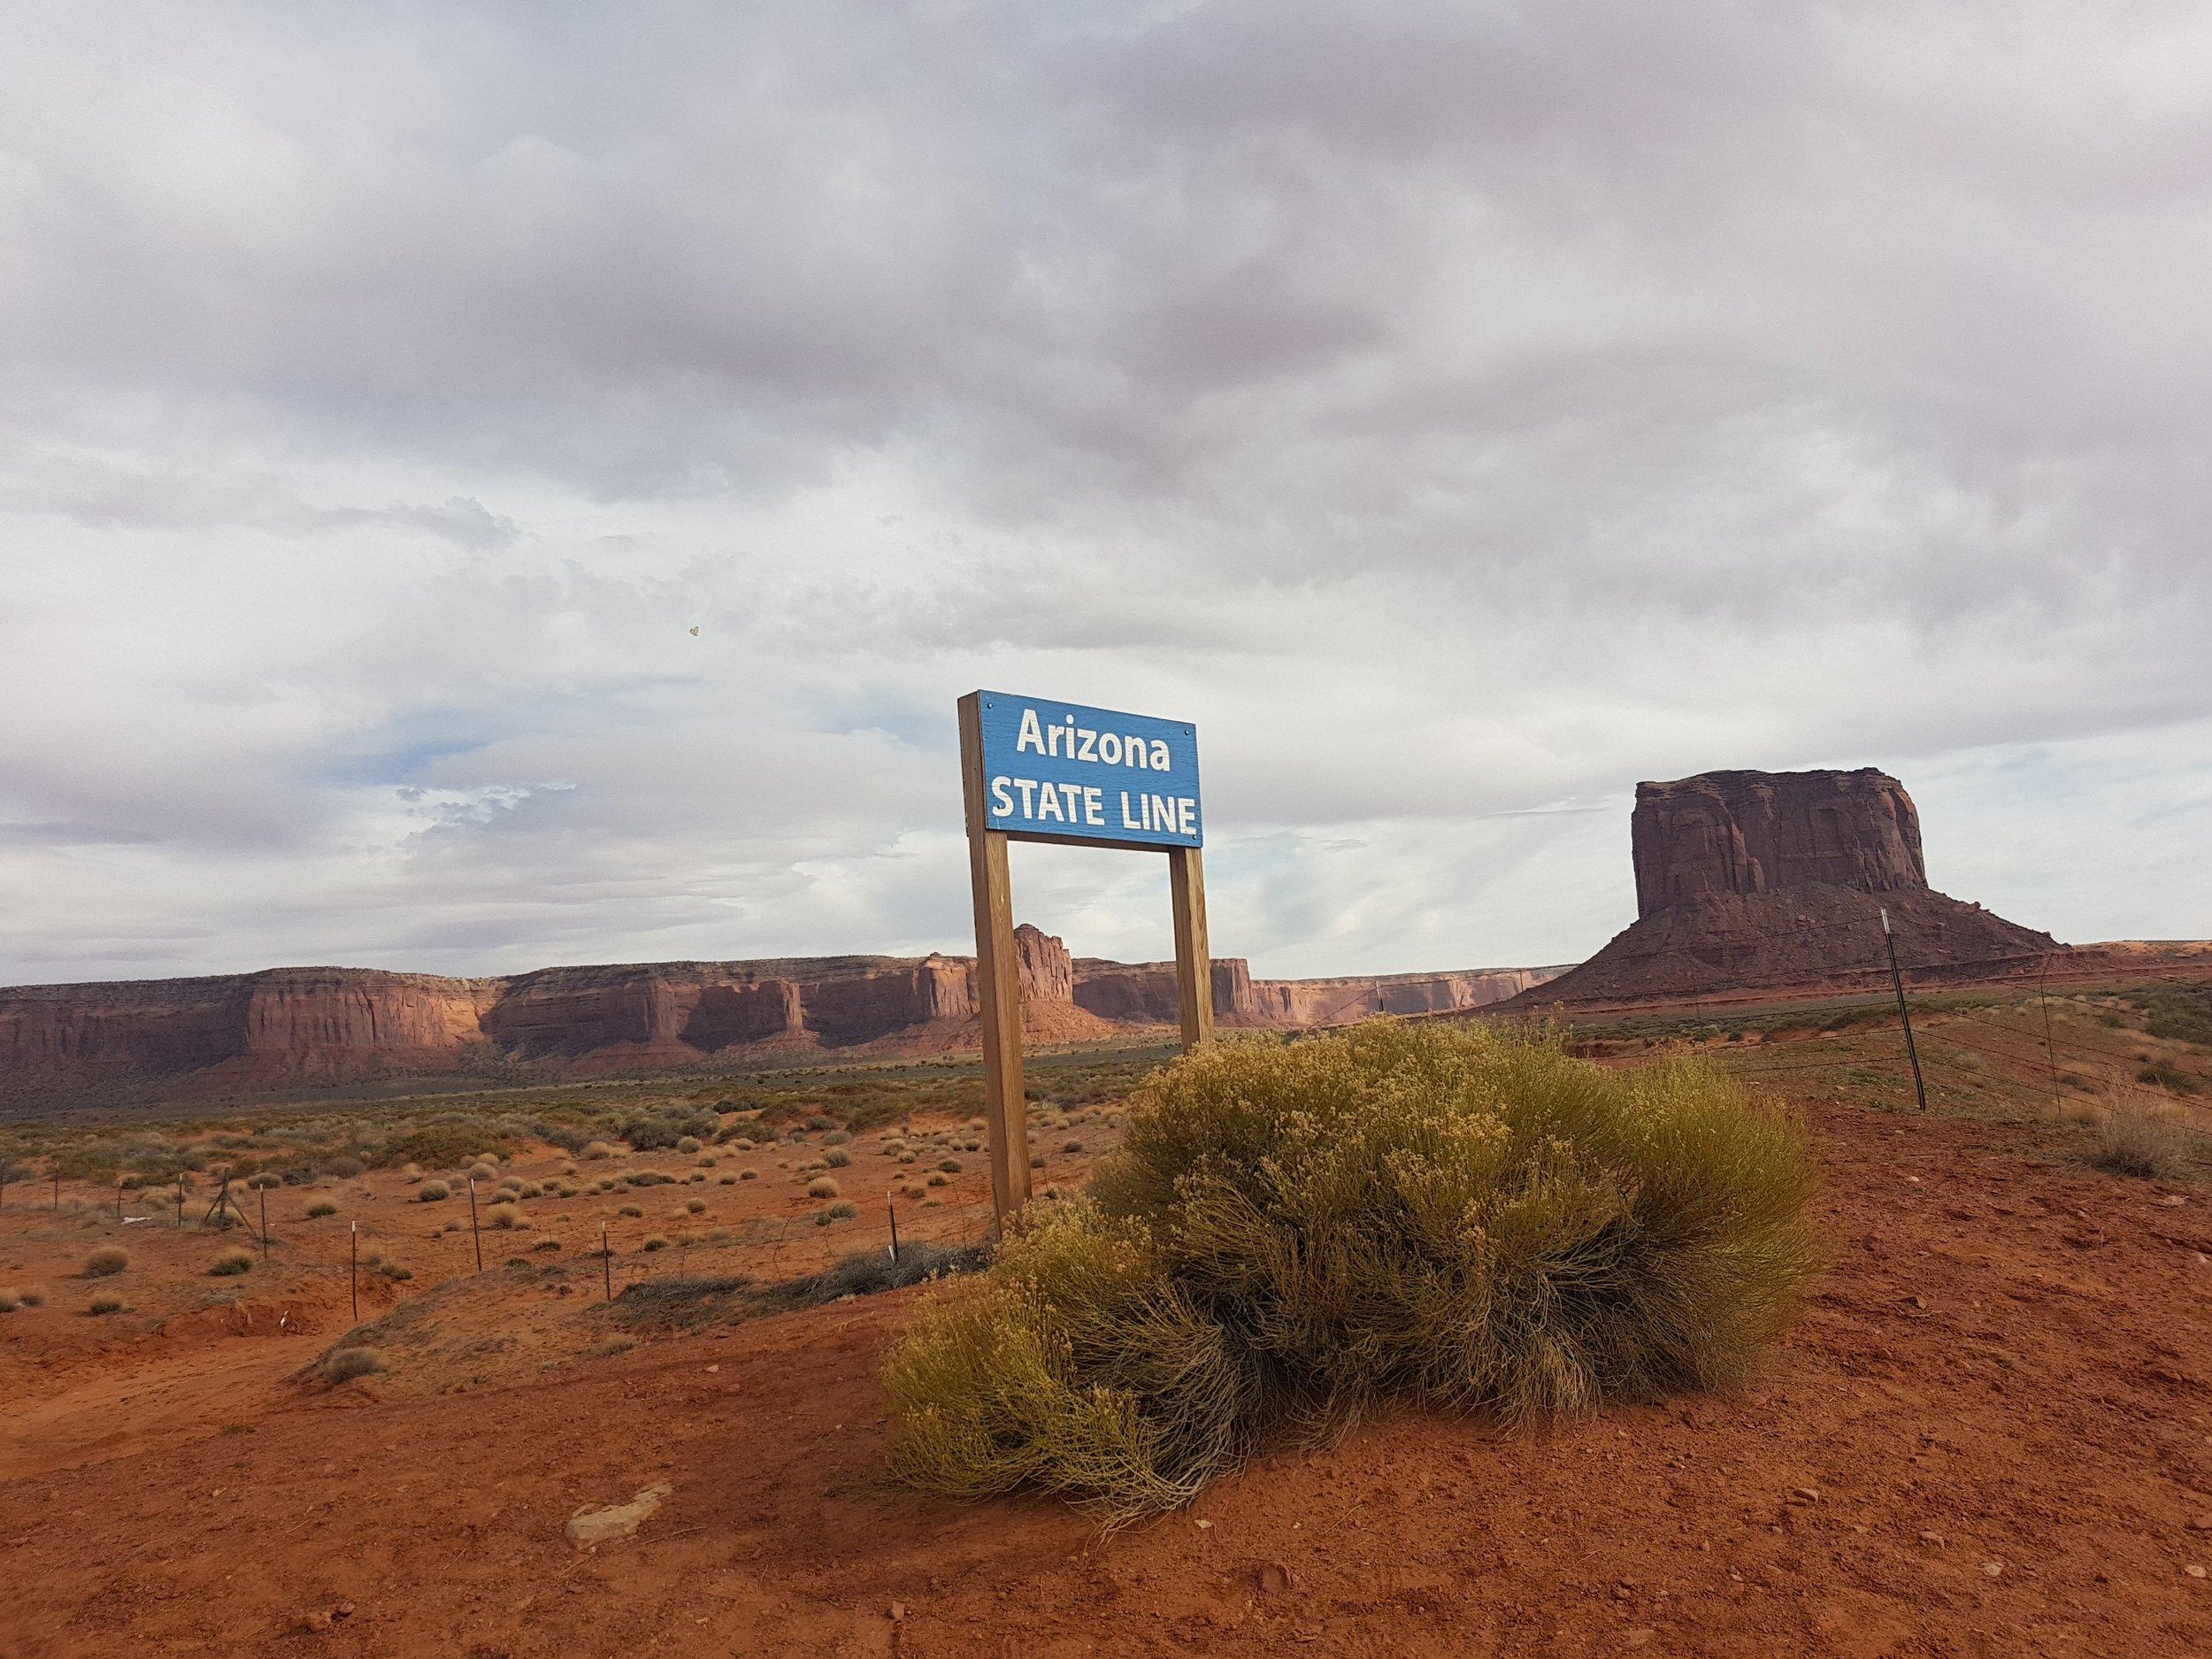 ... De l'autre l'Arizona